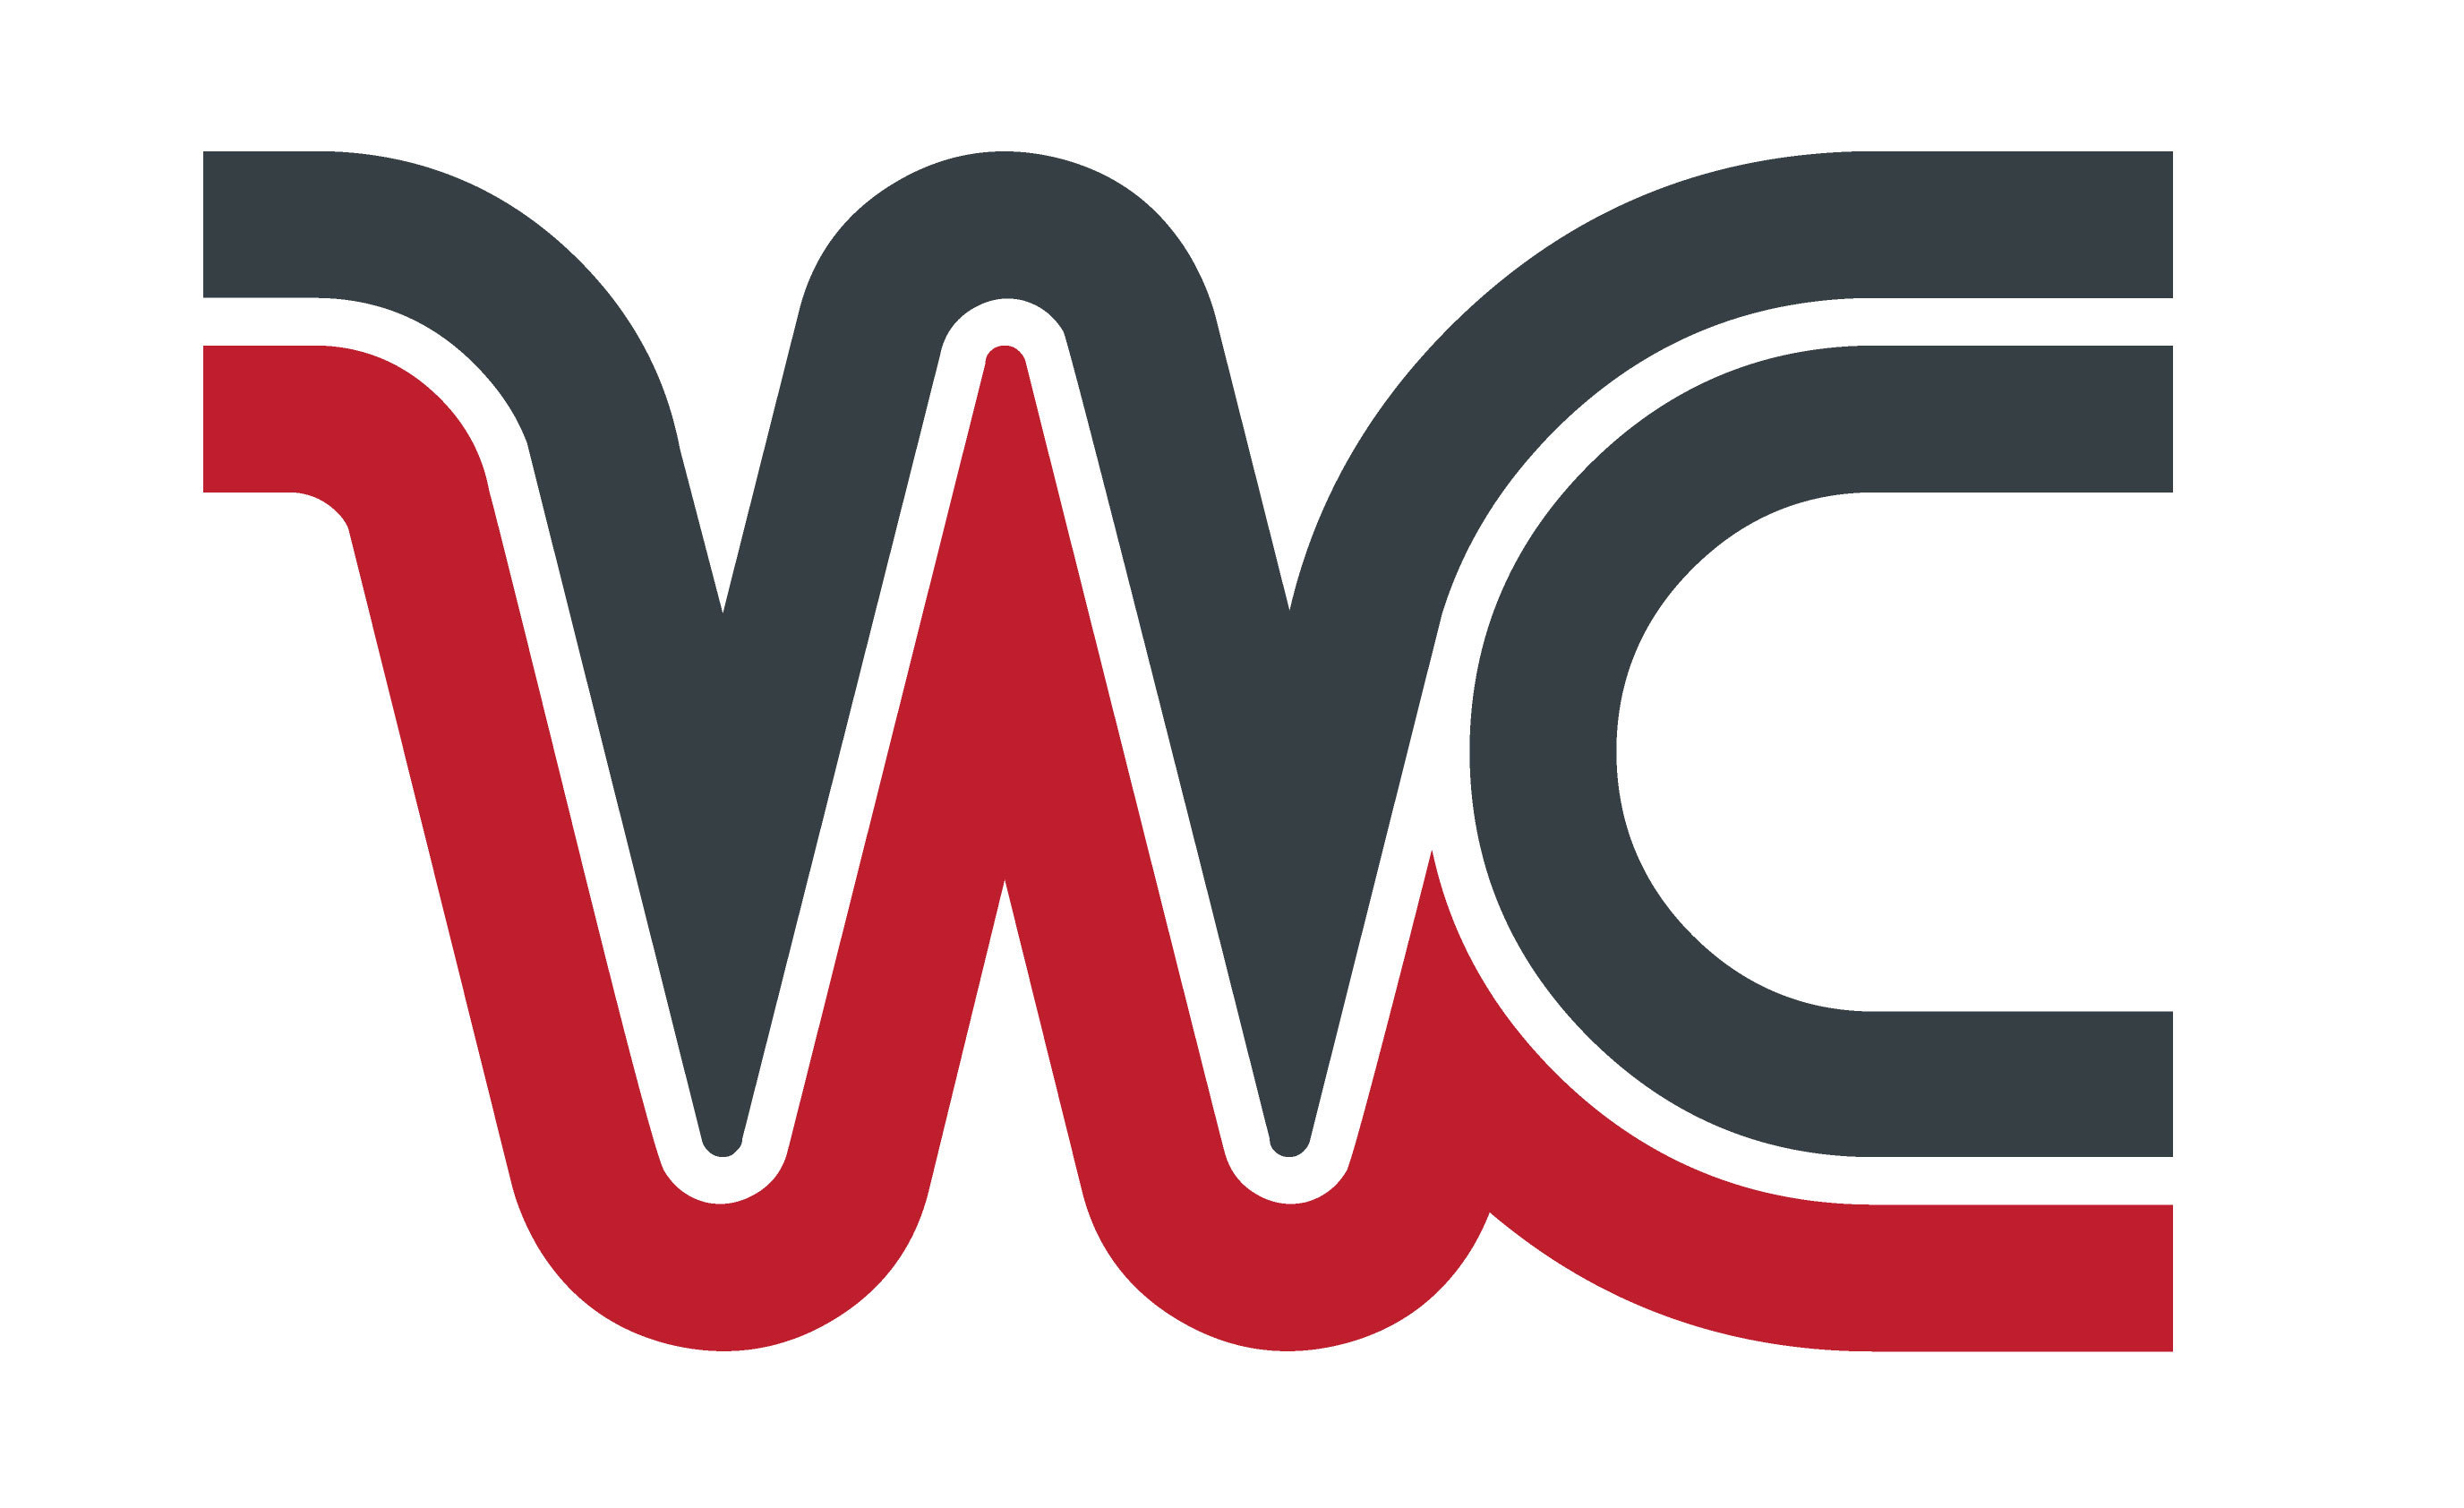 WC logo.